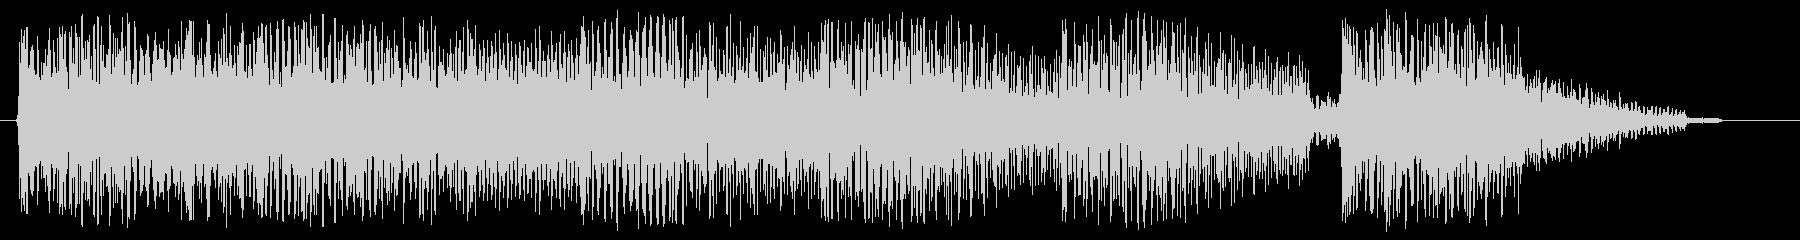 8bitなジングル 場面転換 切替の未再生の波形